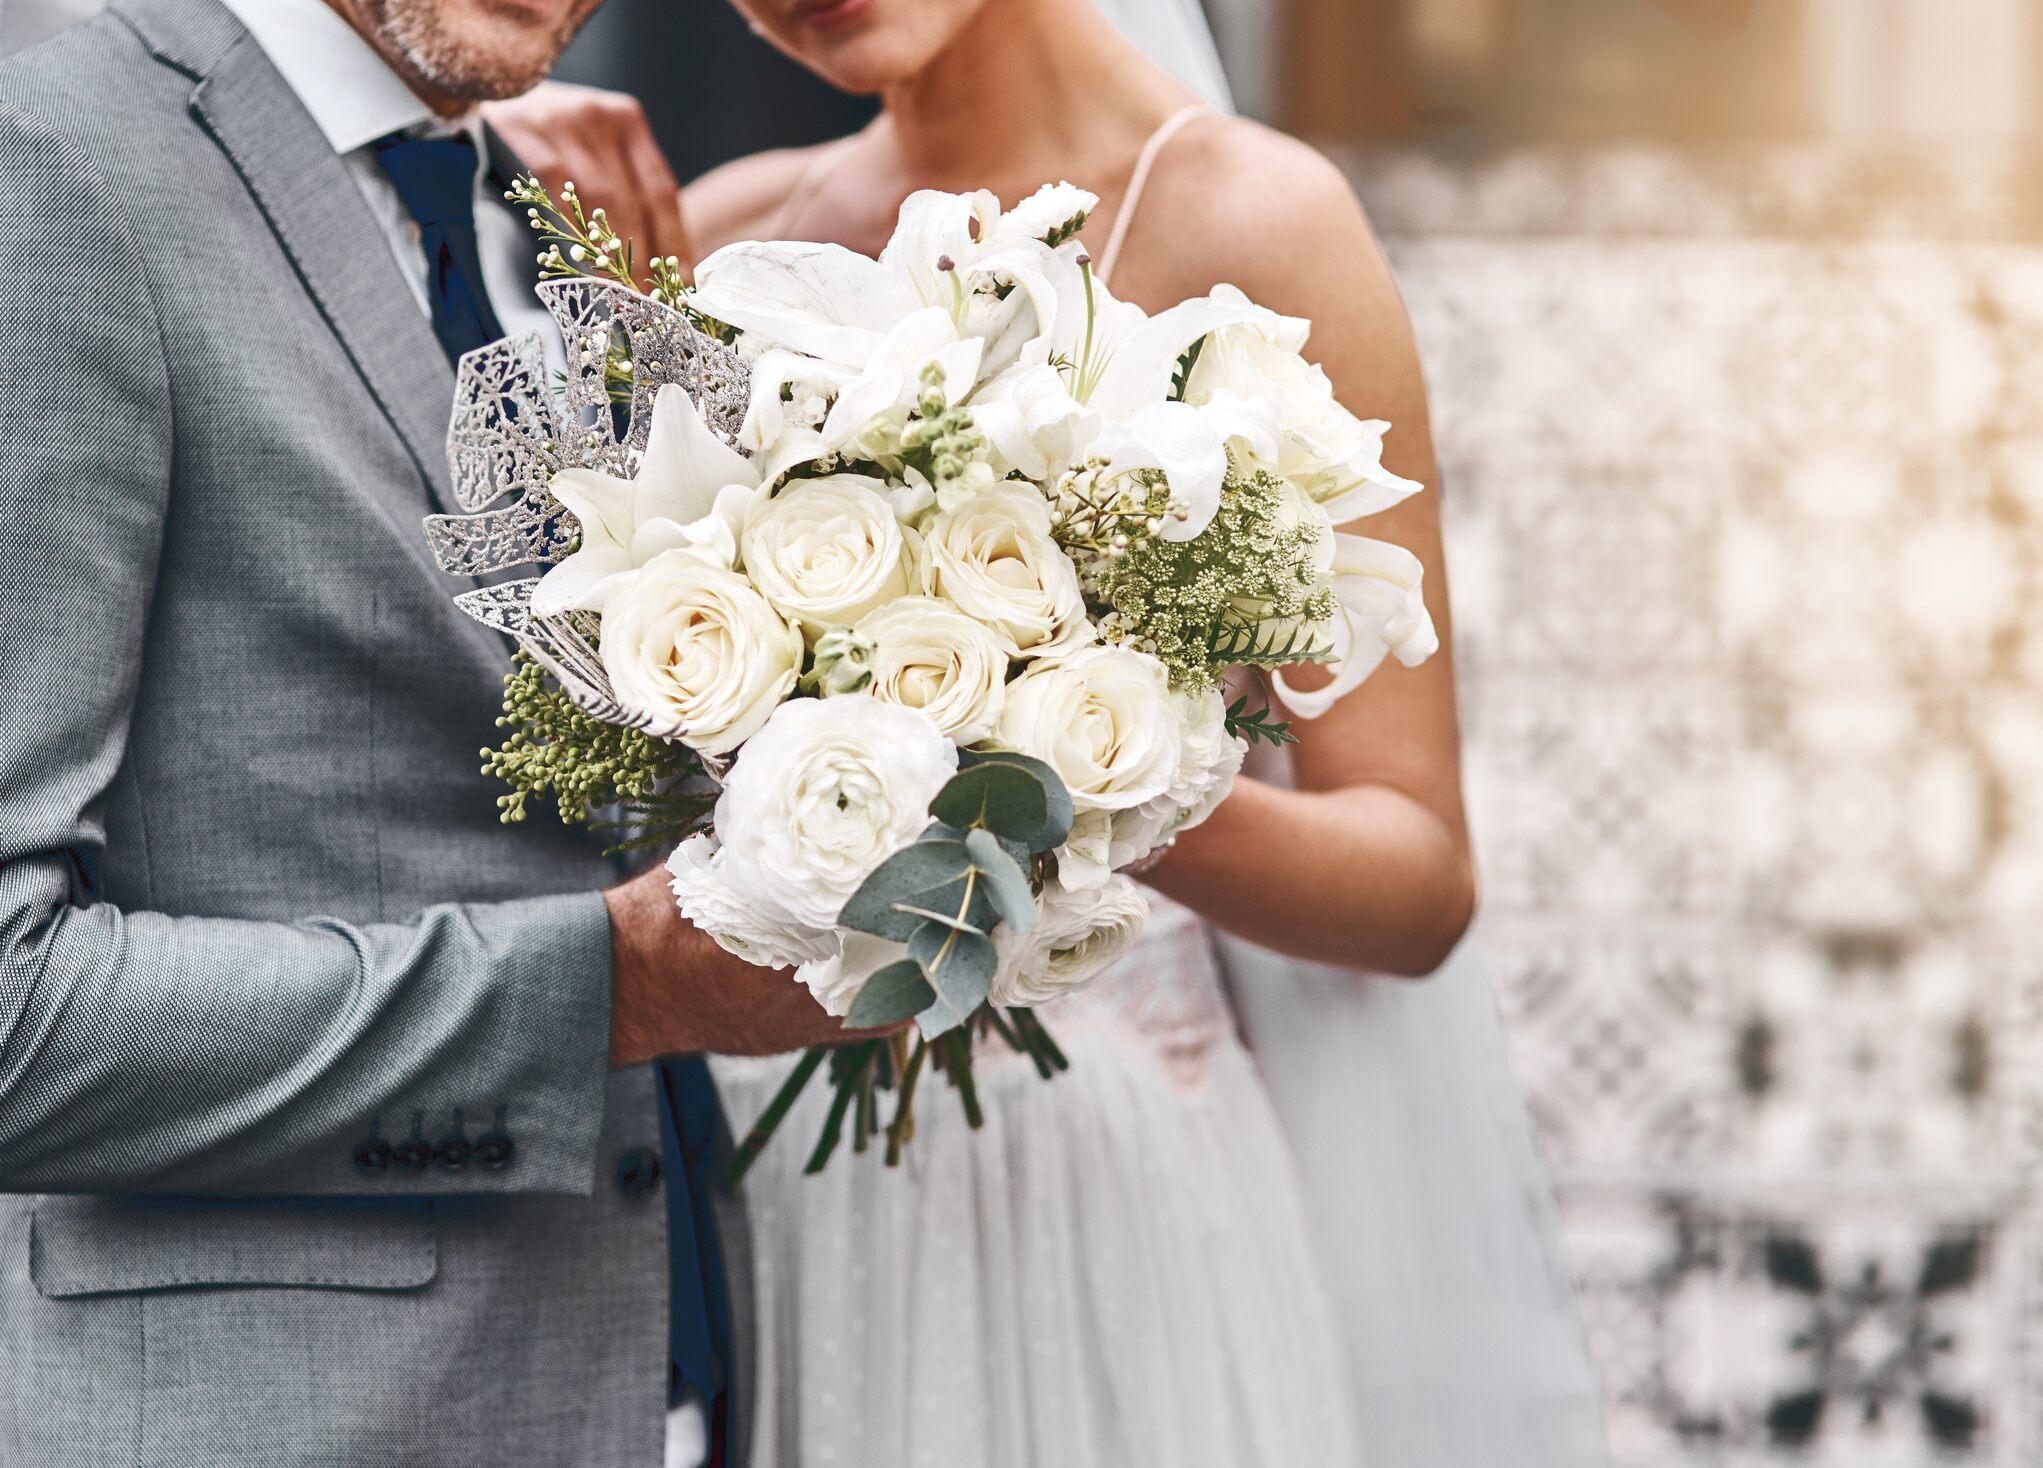 Coronavirus outbreak linked to Maine marriage ceremony reception